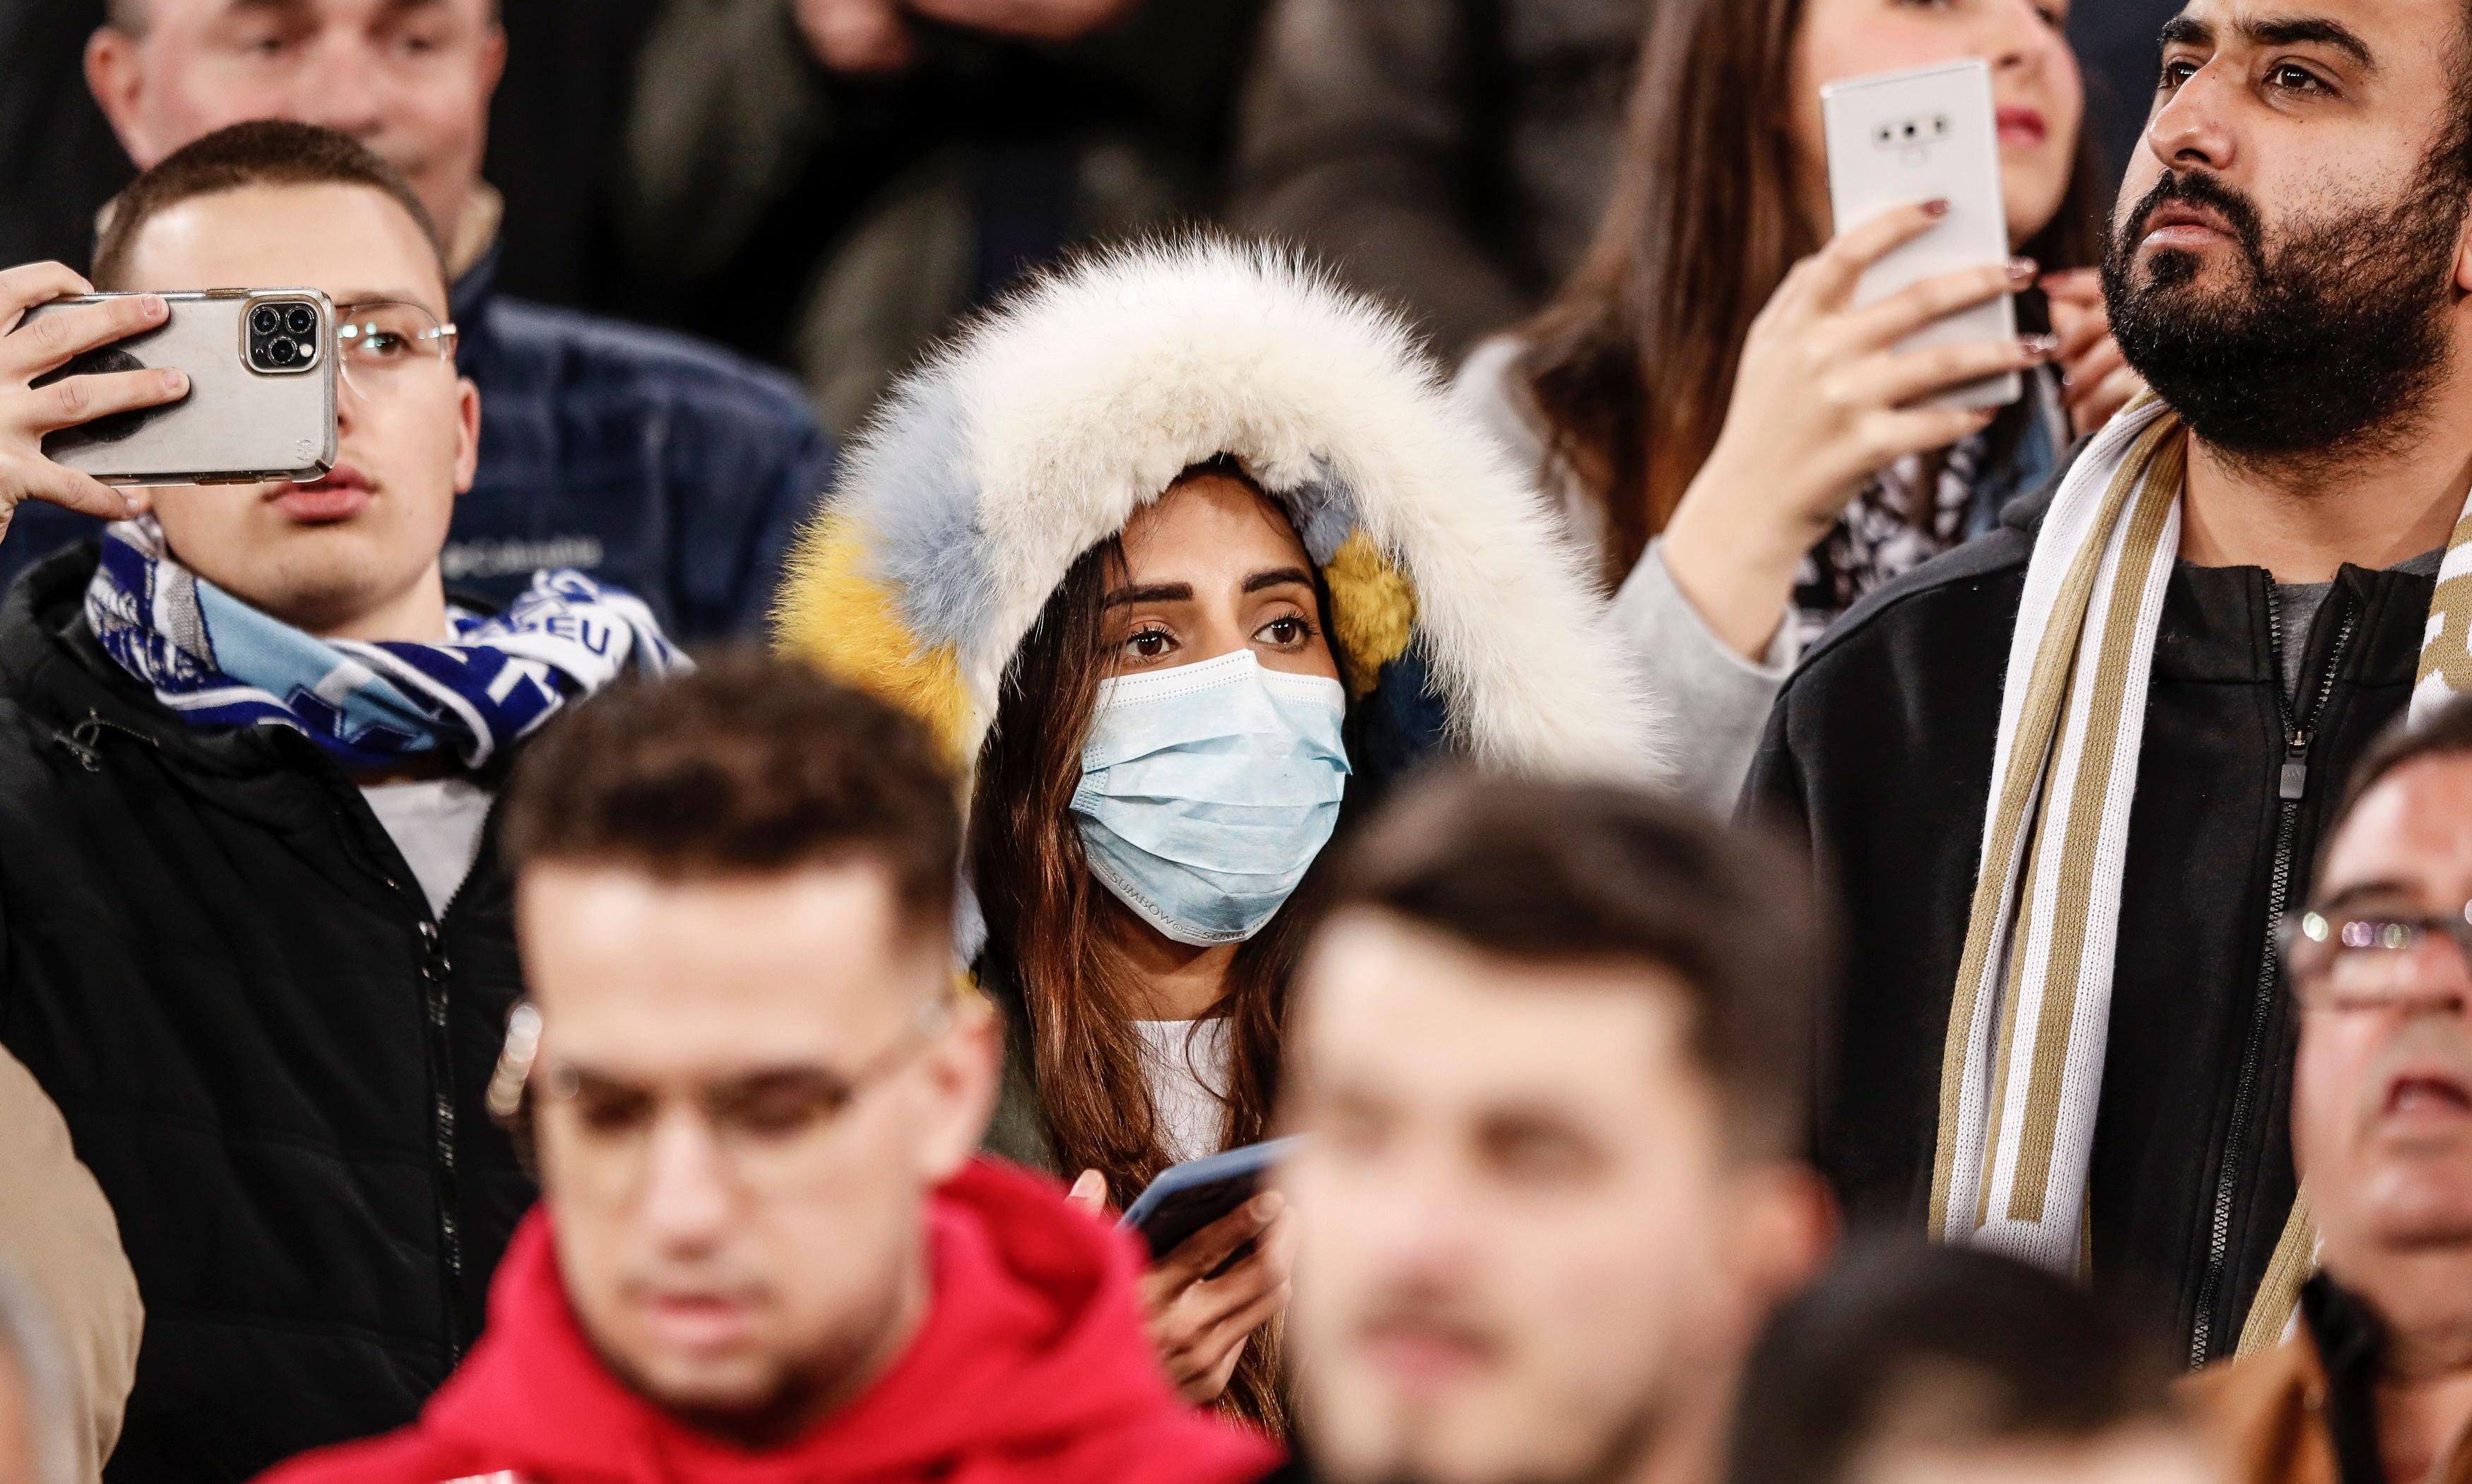 Millions of uninsured Americans like me are a coronavirus timebomb